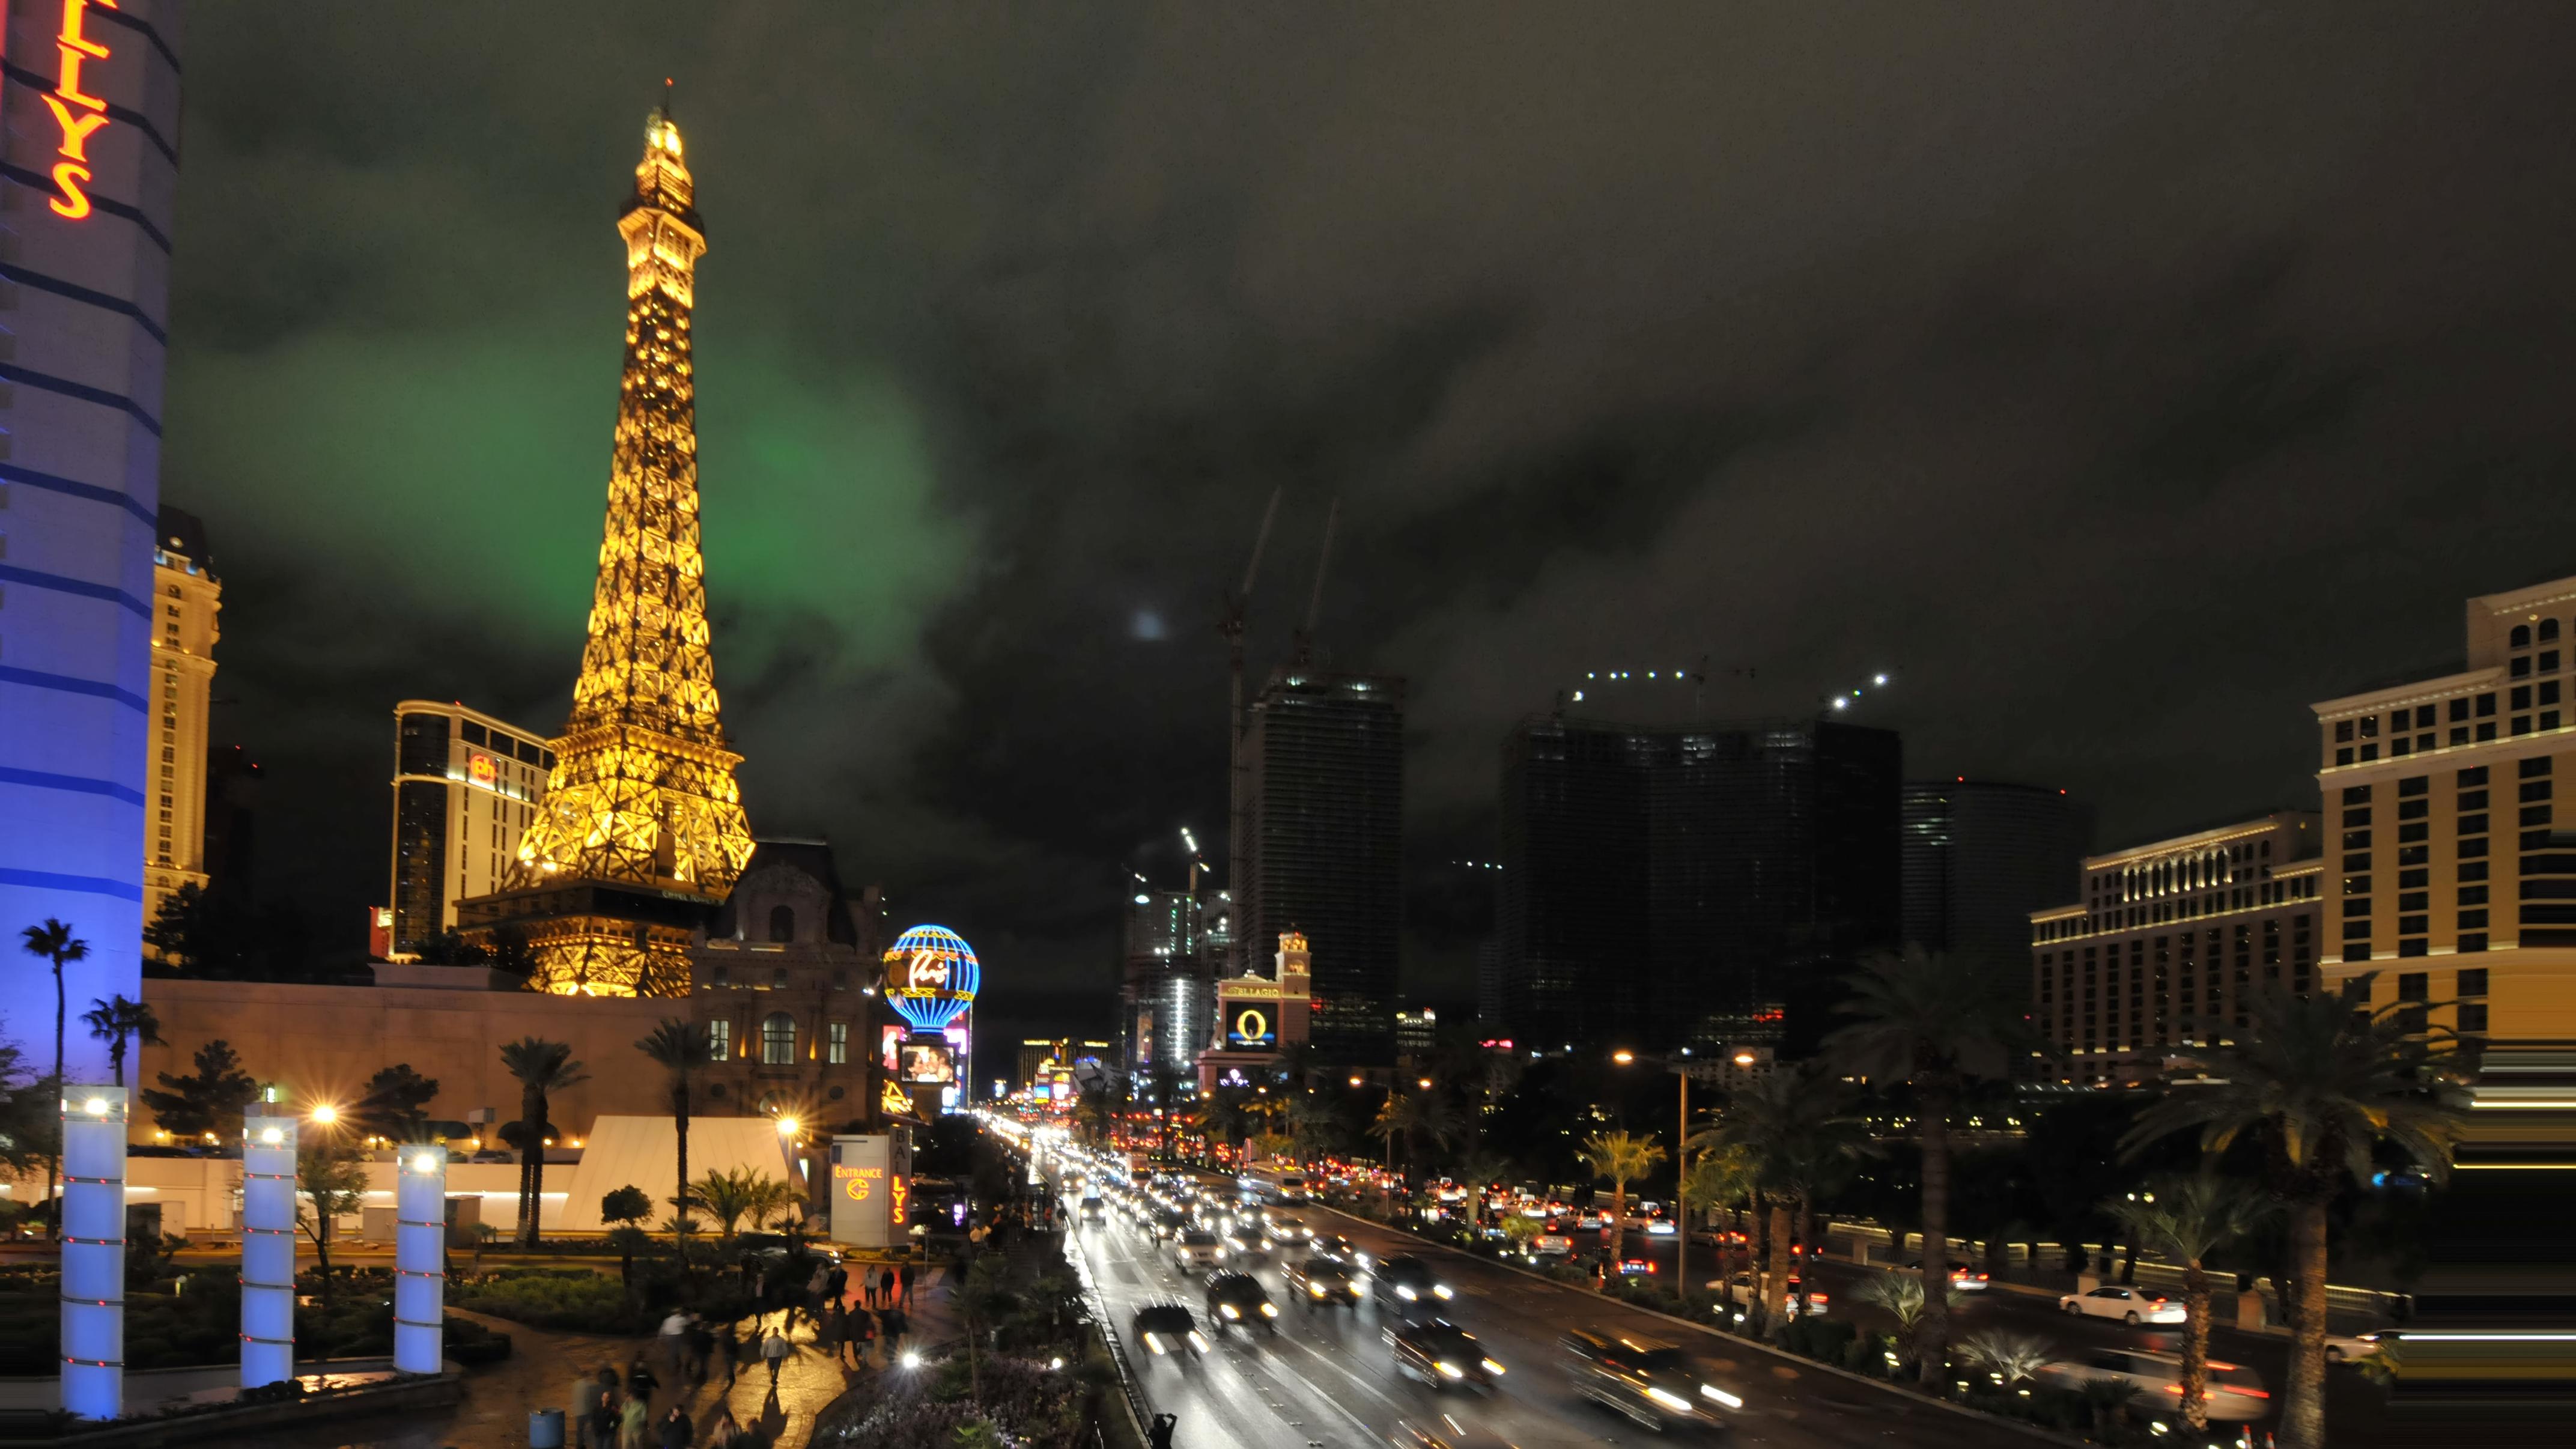 las vegas city - photo #30